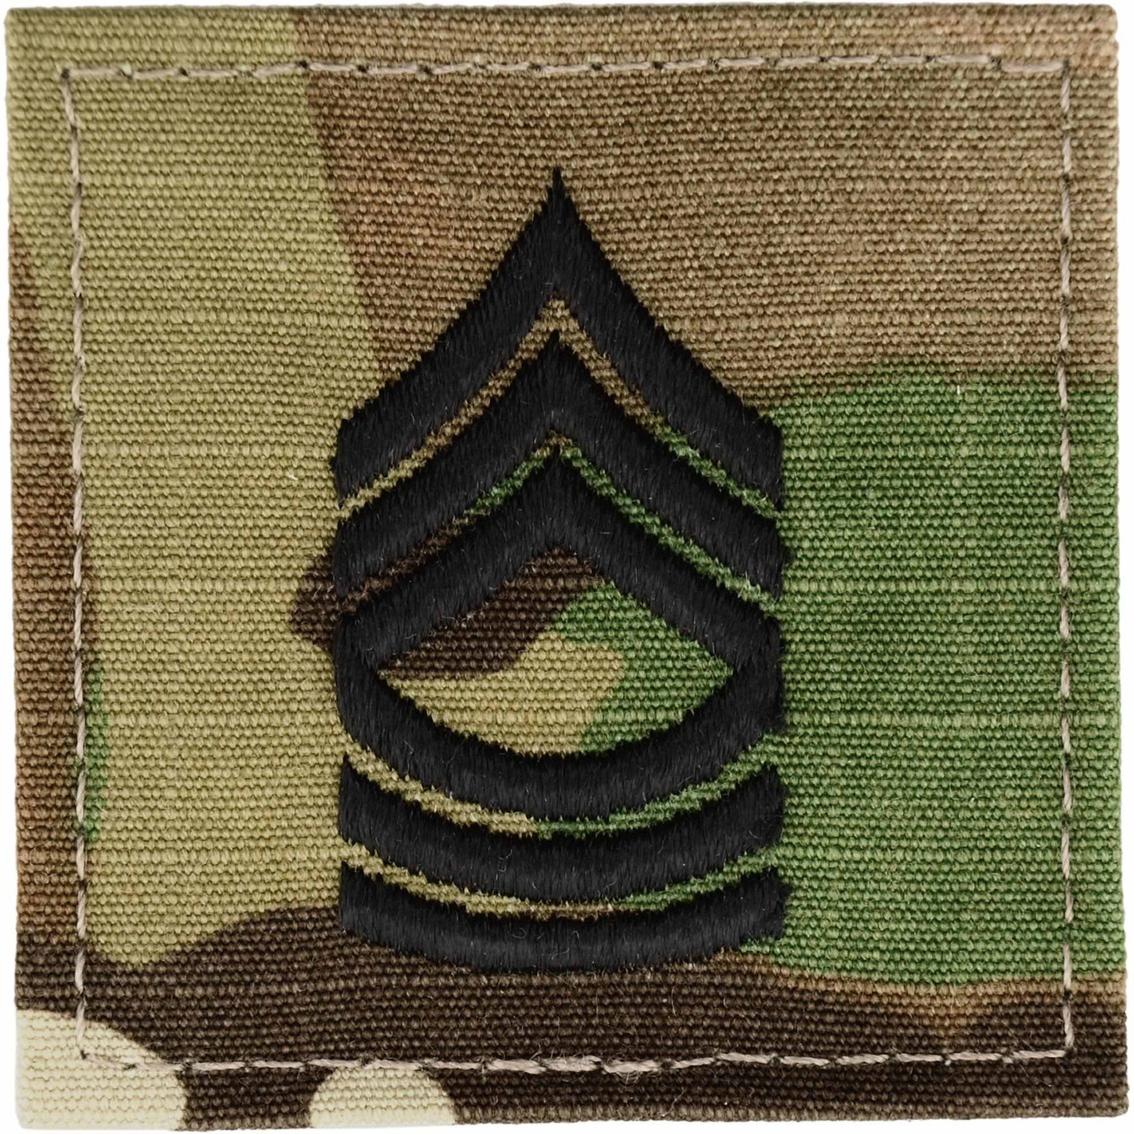 Aafes army msg rank clipart jpg free stock Army Rank Master Sergeant (msg) Velcro (ocp), 2 Qty Per Pkg   Ocp ... jpg free stock